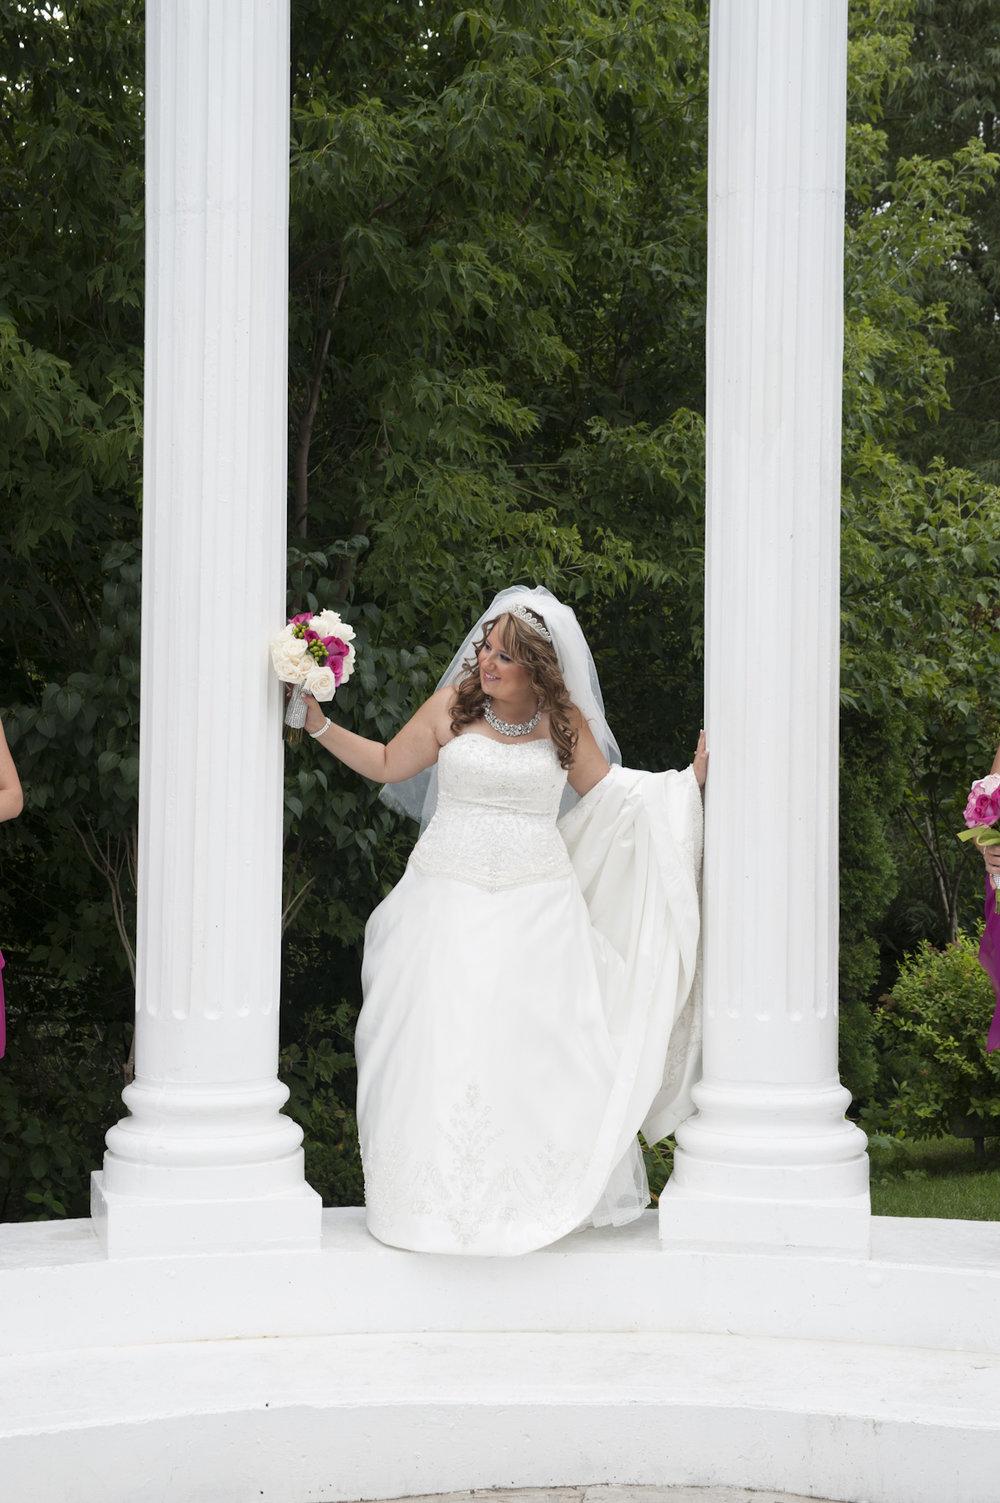 Paradise Banquet Hall Bride standing inside atrium